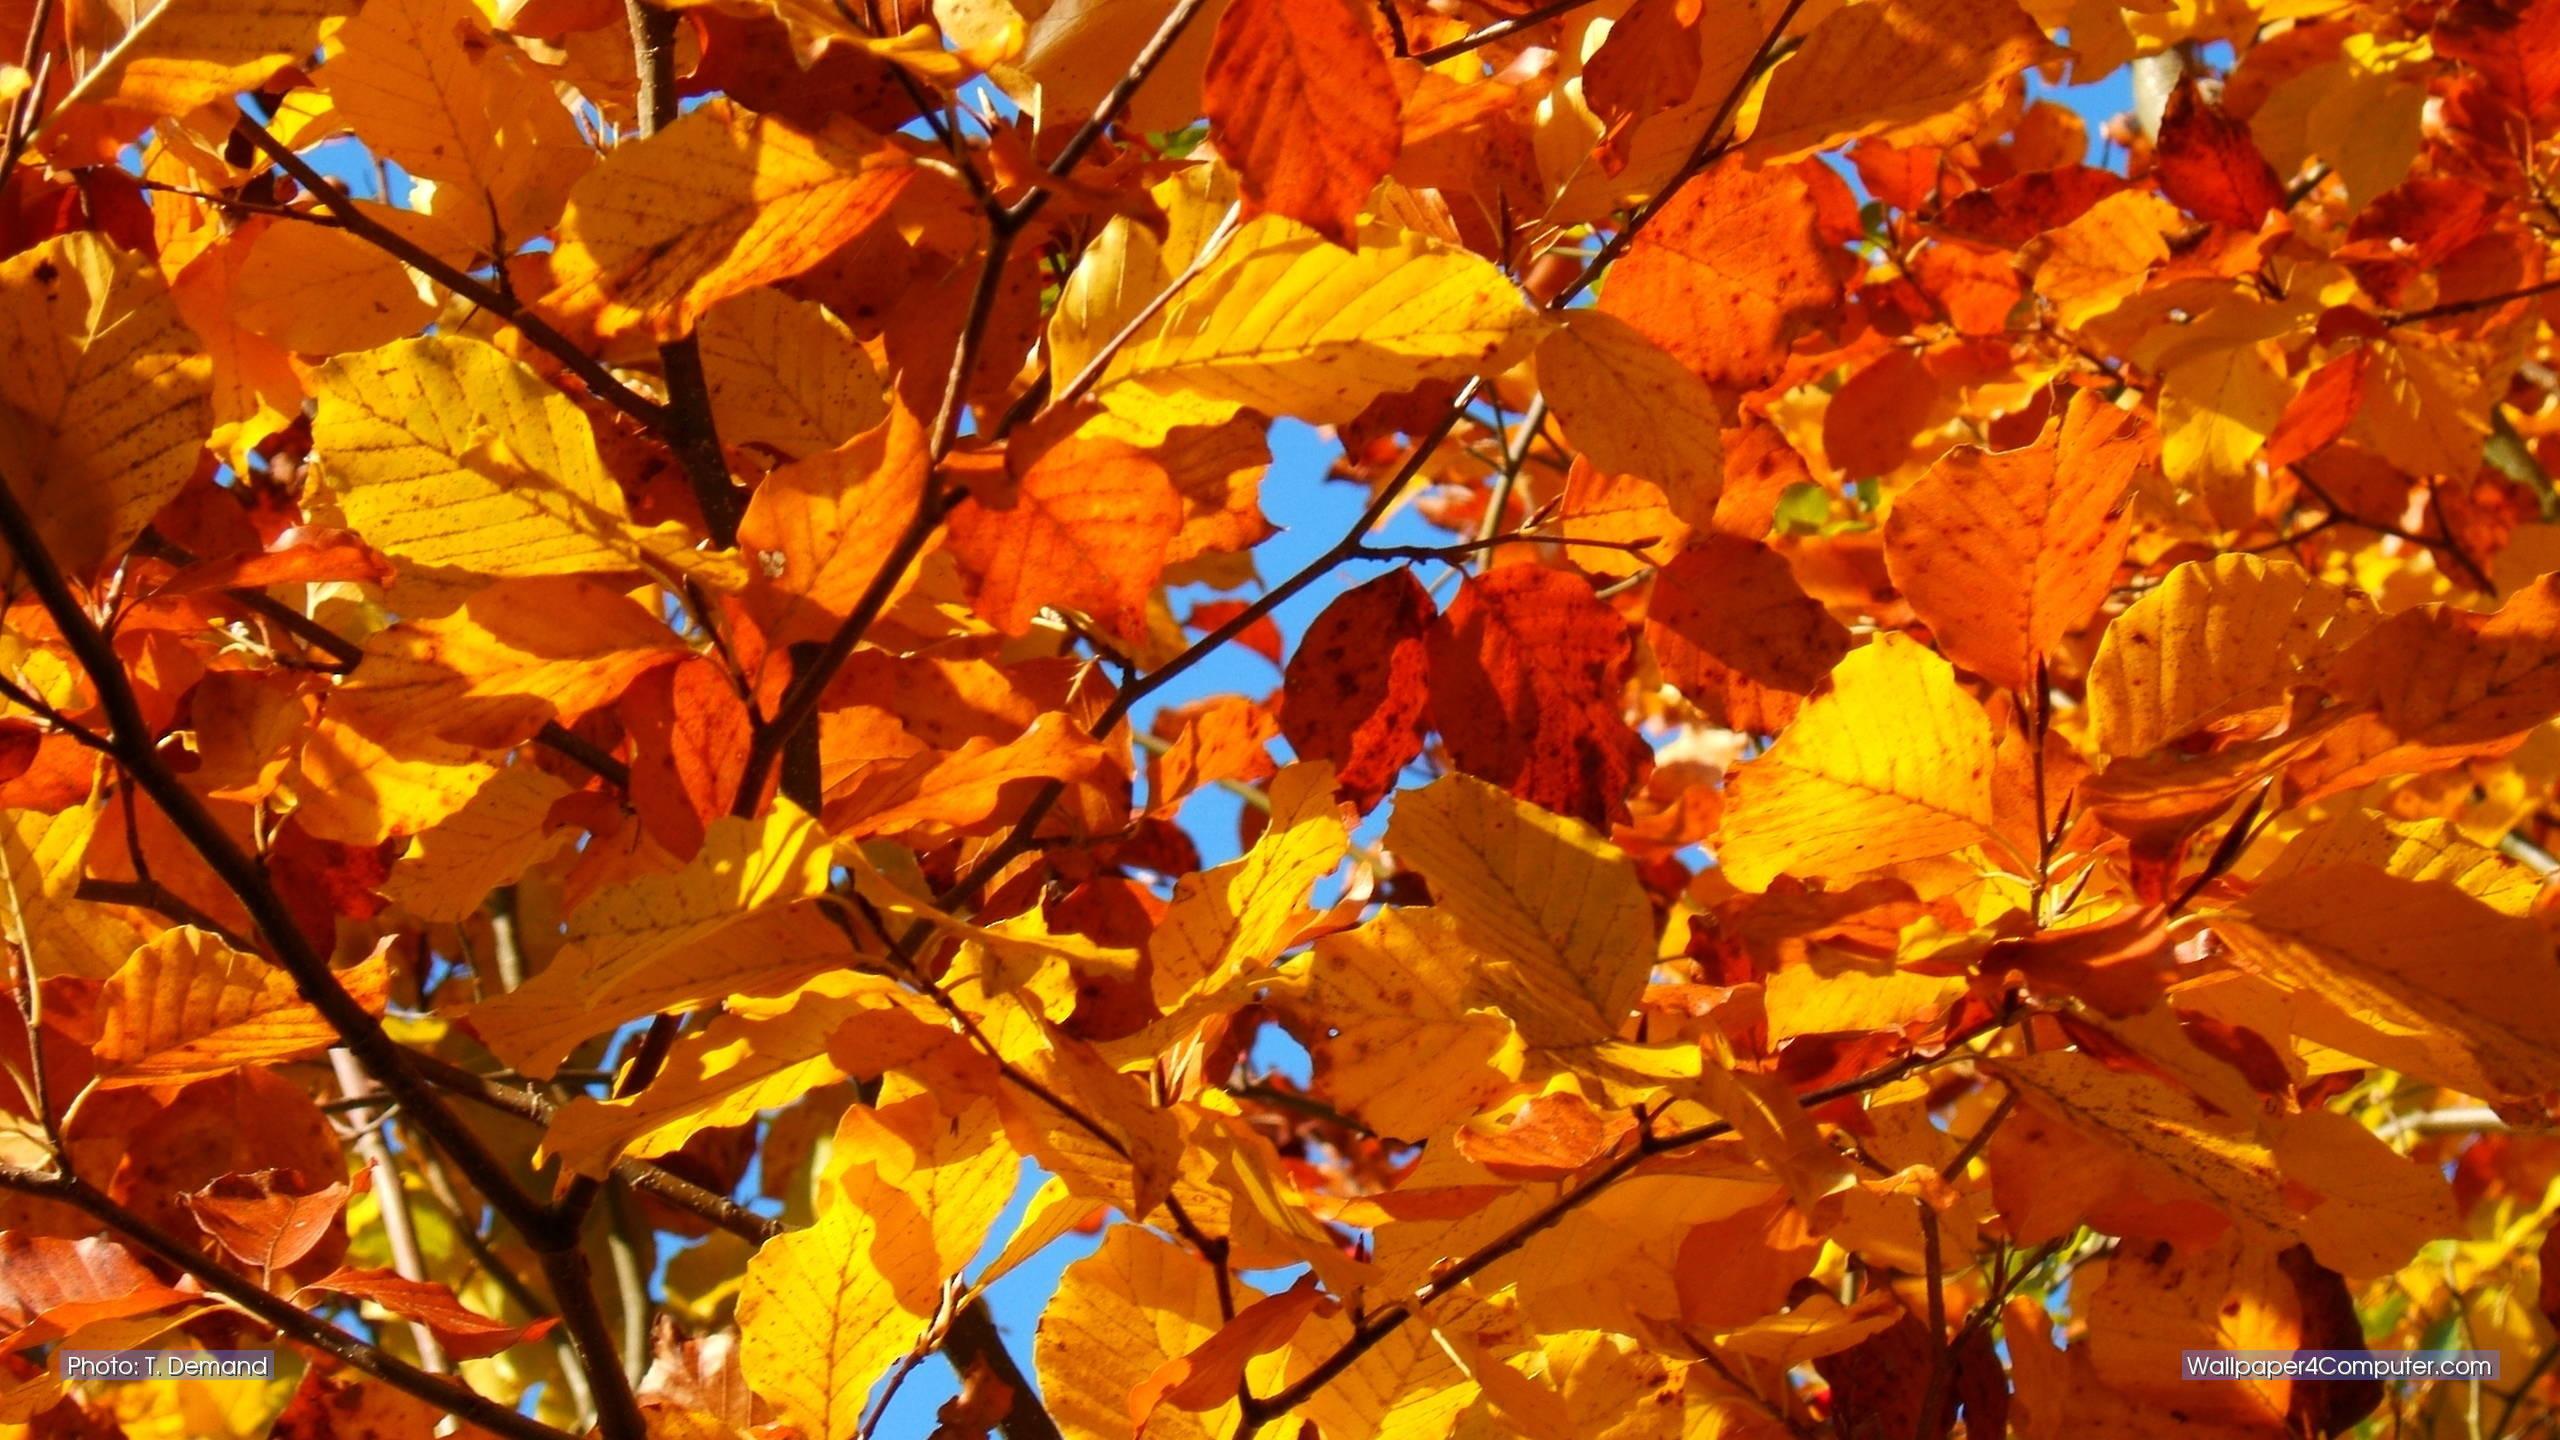 Iphone Wallpaper Fall Leaves Die 78 Besten Herbstwald Hintergrundbilder